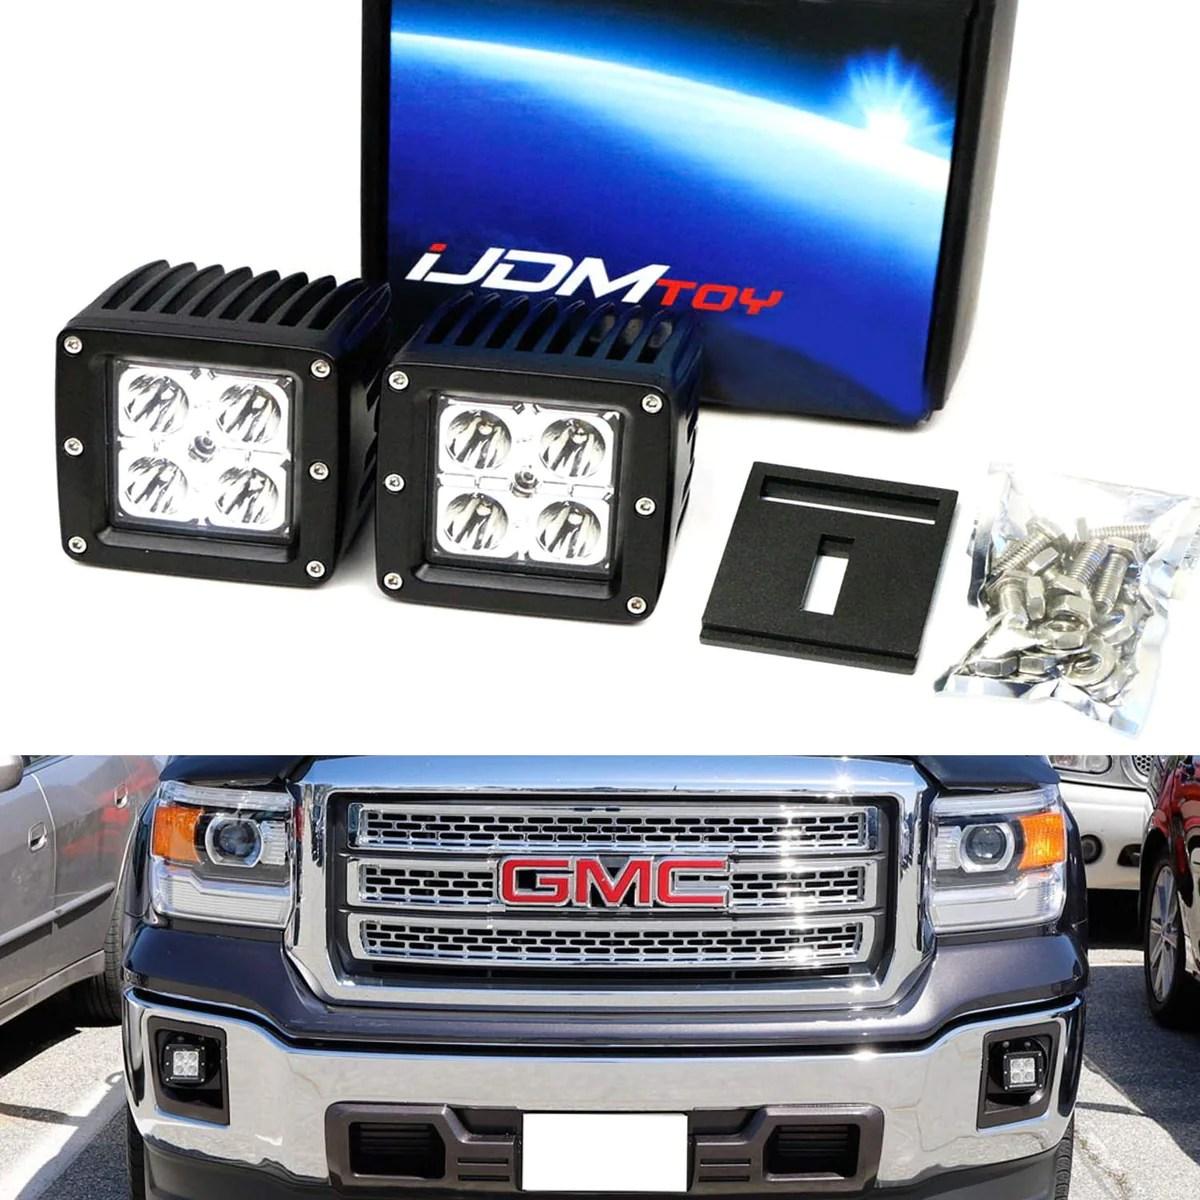 small resolution of 14 15 gmc sierra 1500 15 18 2500 3500 hd led pod fog light kit ijdmtoy com